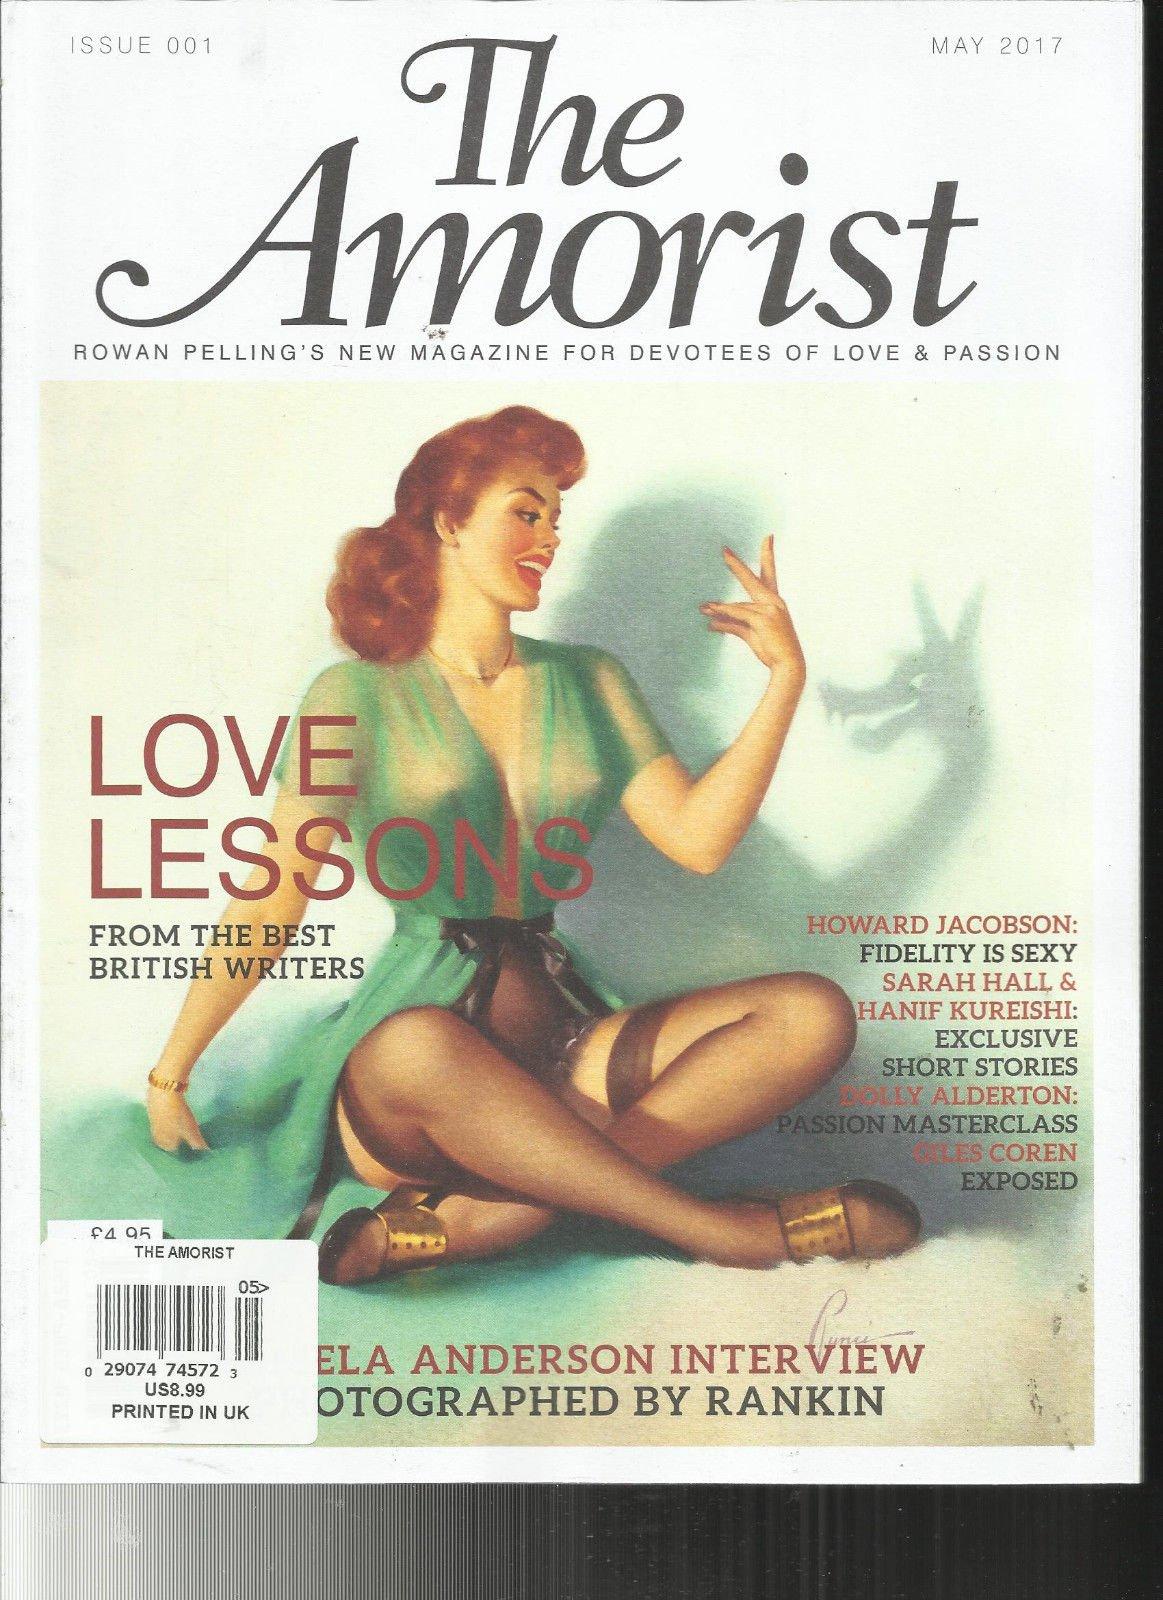 THE AMORIST MAGAZINE,ROWAN PELLING'S NEW MAGAZINE FOR DEVOTEES OF LOVE & PASSION